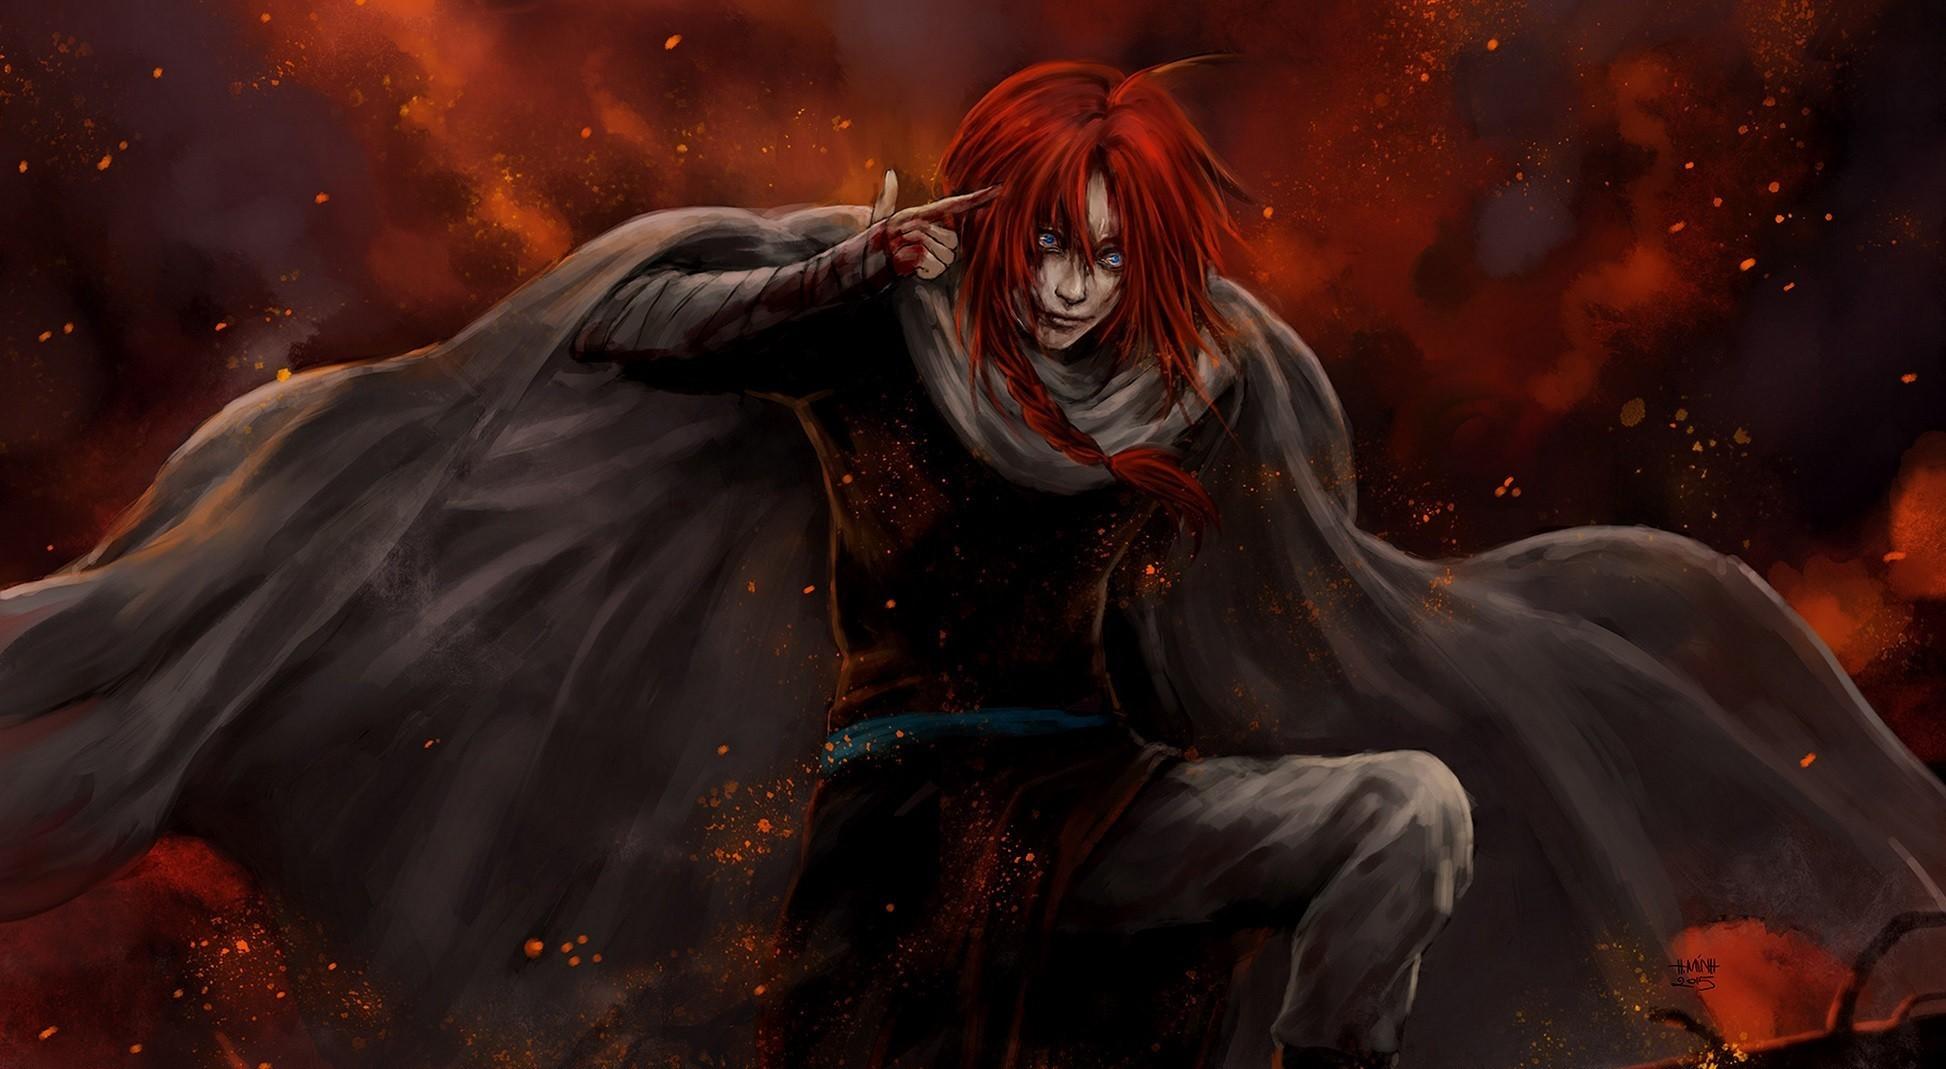 Fondos De Pantalla Arte Fantasía Anime Obra De Arte